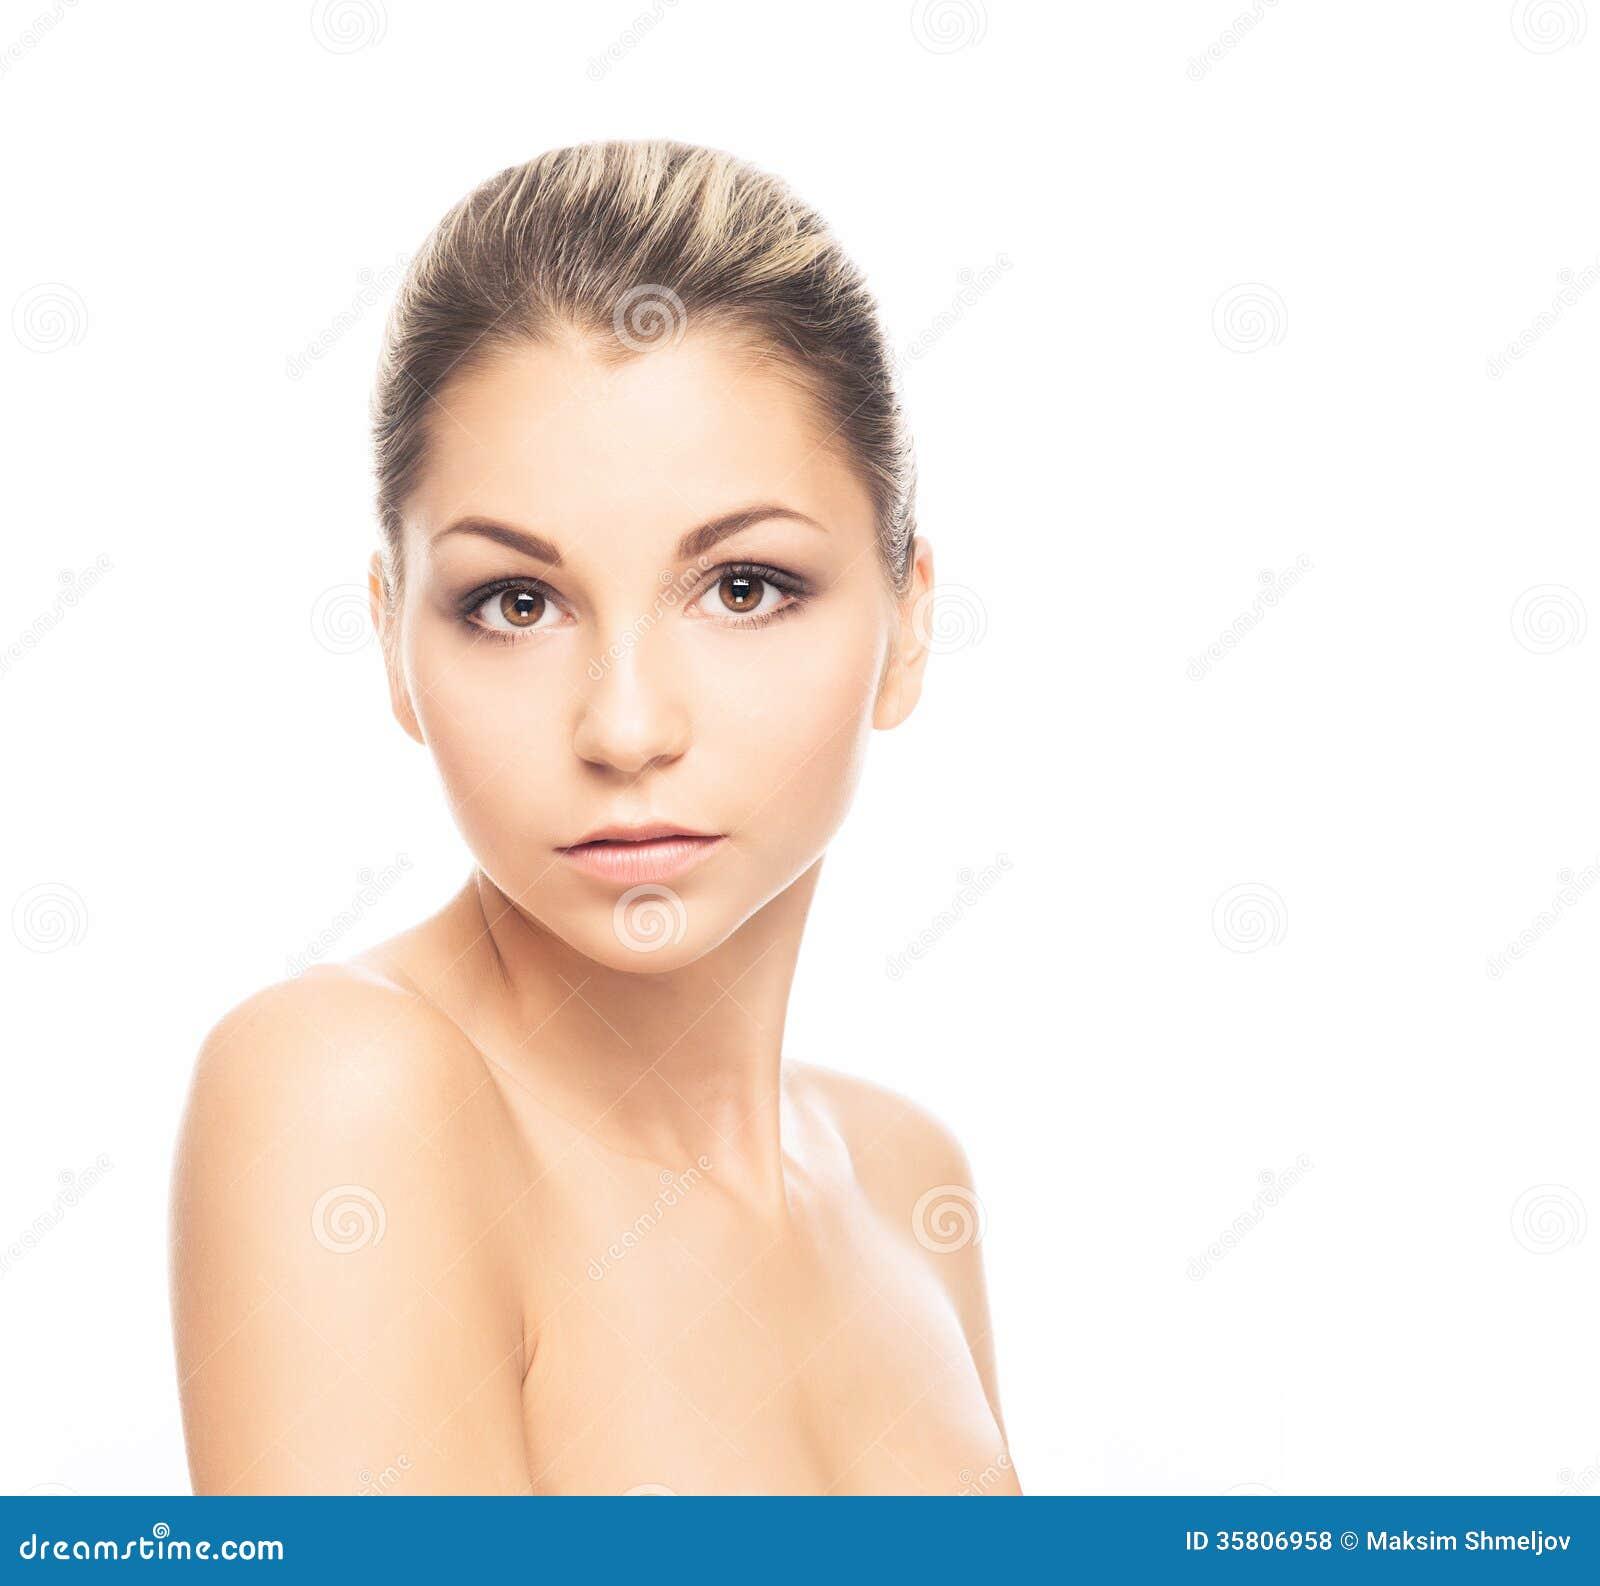 Woman Posing Naked 26